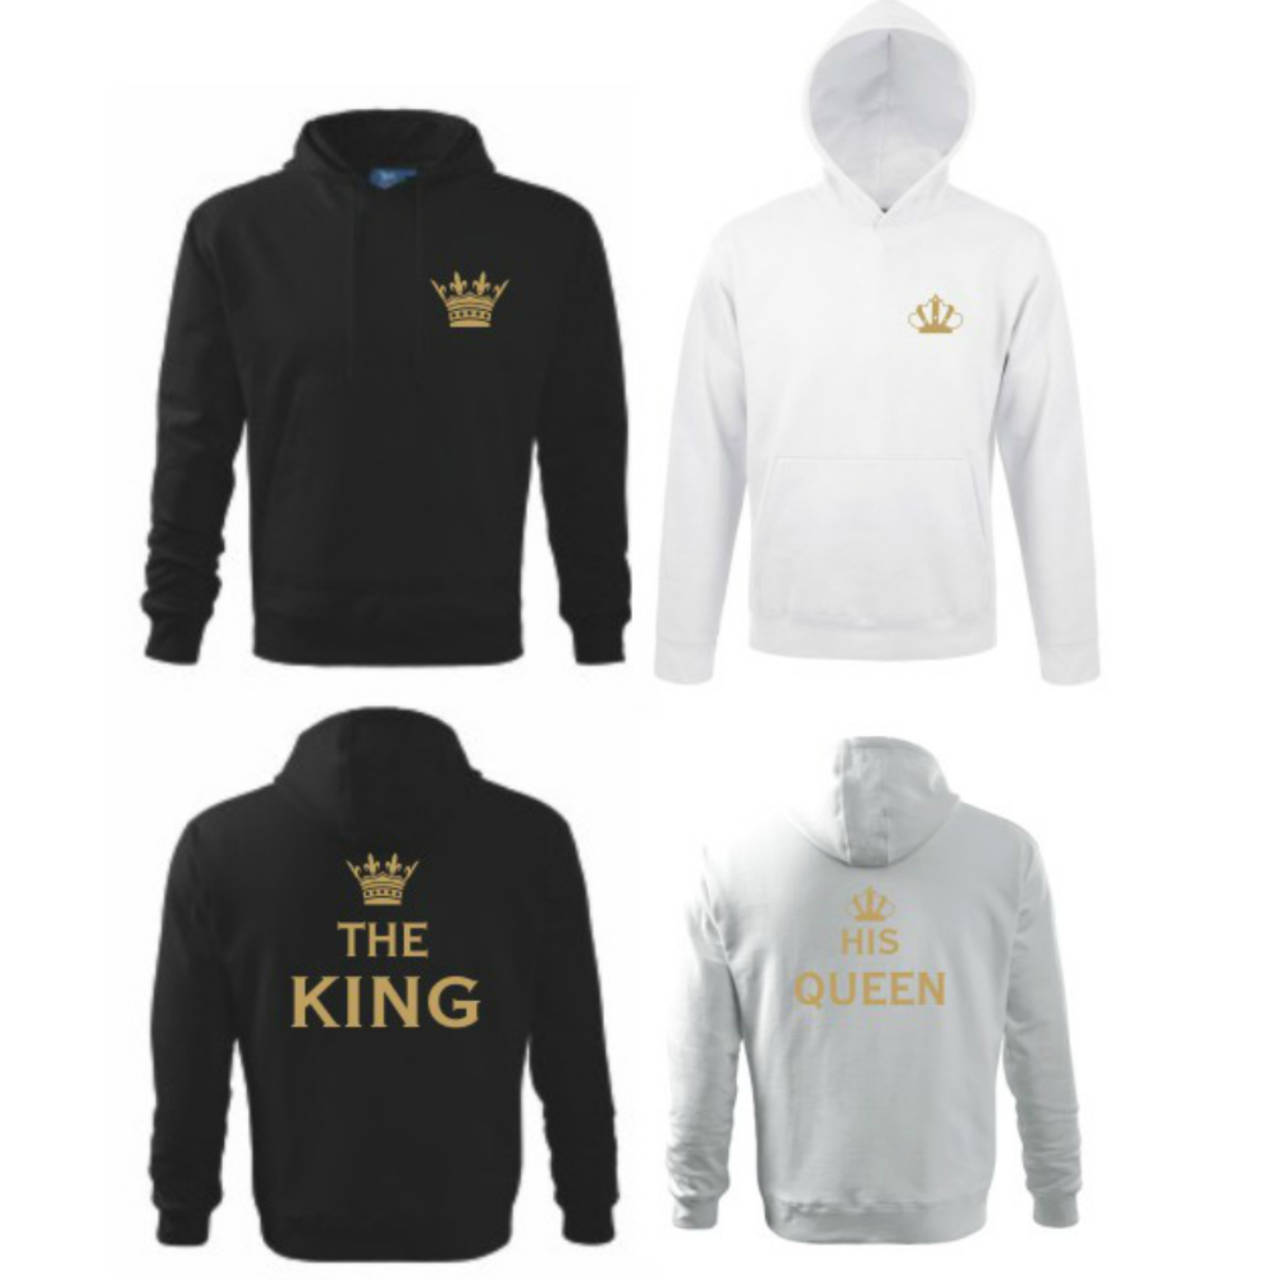 3981bb856d55 King a Queen - zaľúbené mikiny pre pár   trickoland - SAShE.sk ...